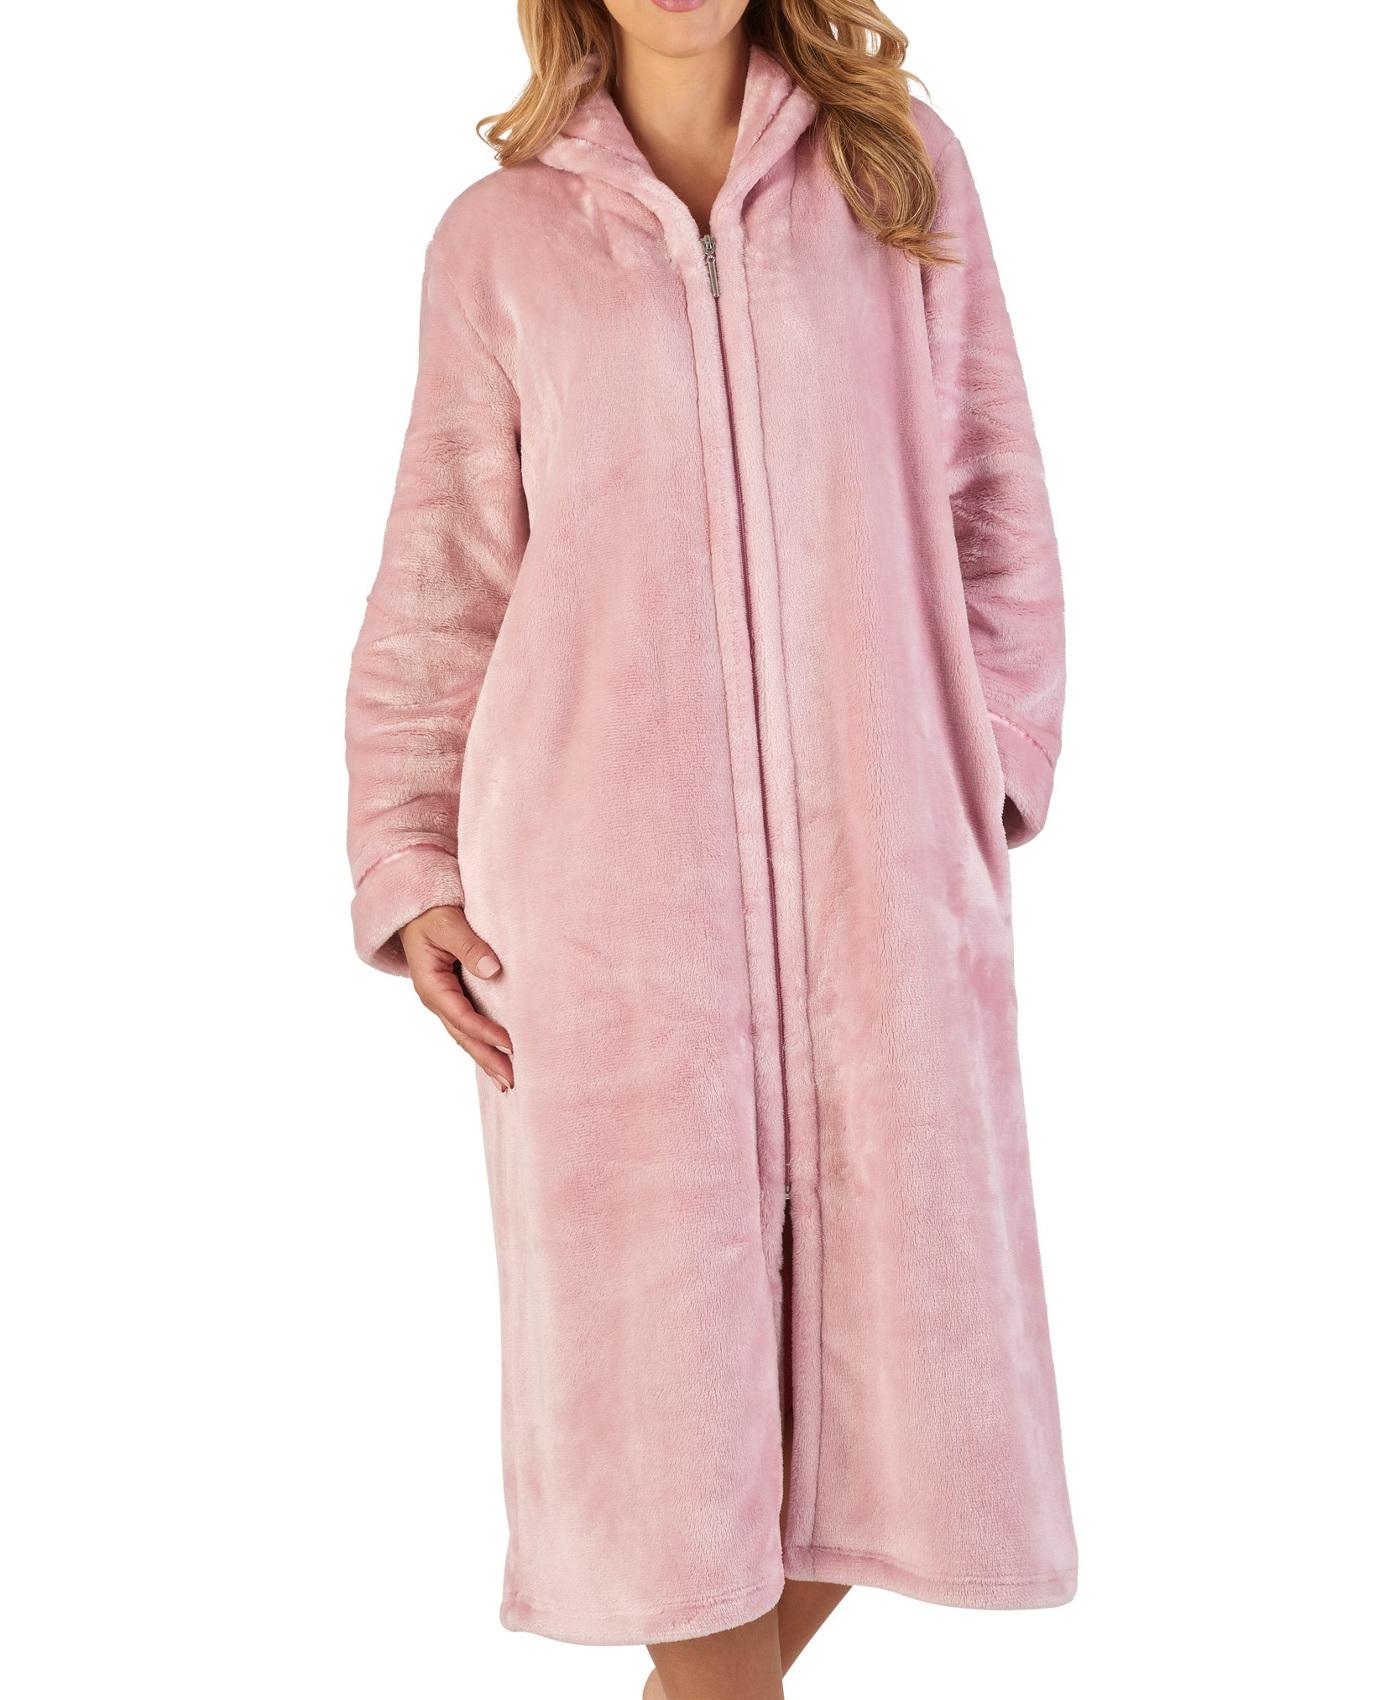 Slenderella Womens Luxury Thick Flannel Fleece Dressing